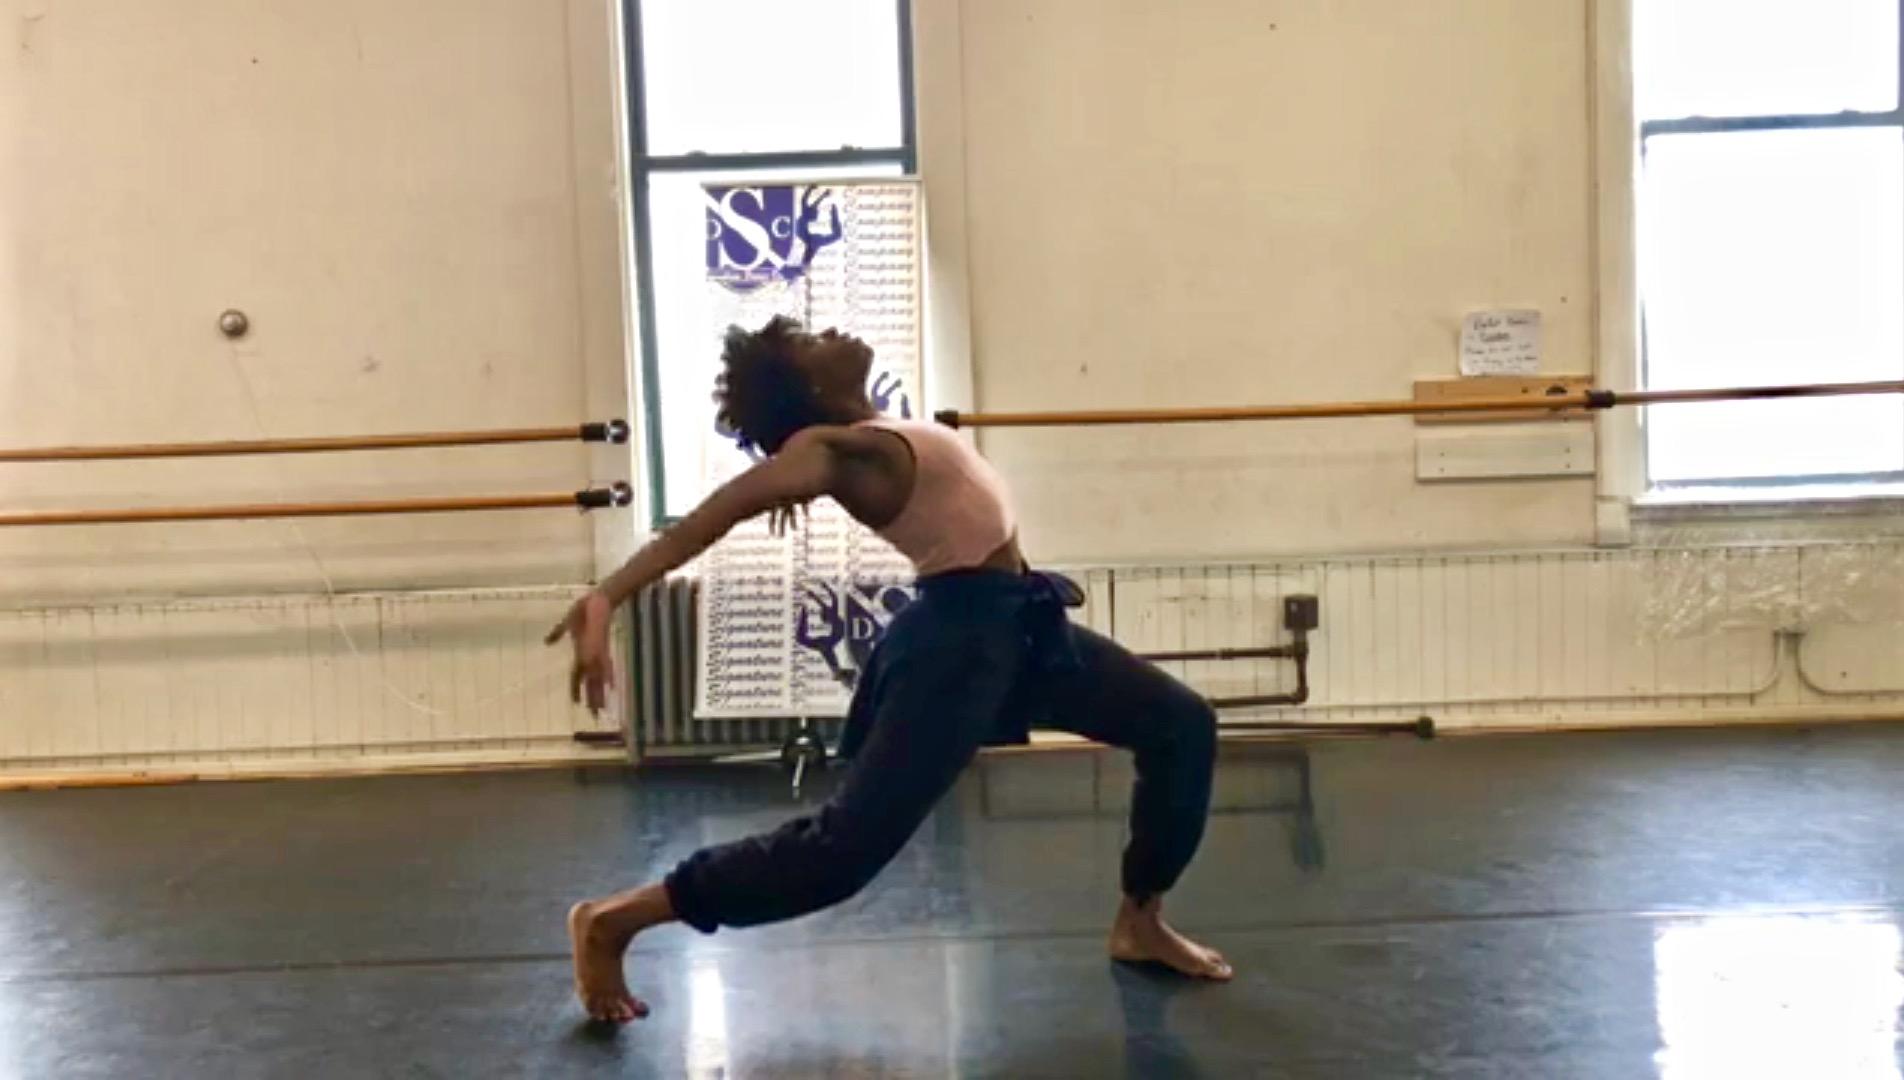 Signature Dance Company instructor Kimi Evelyn teaches a virtual dance class via Facebook Live. Photo provided by Signature Dance Company/NNS.